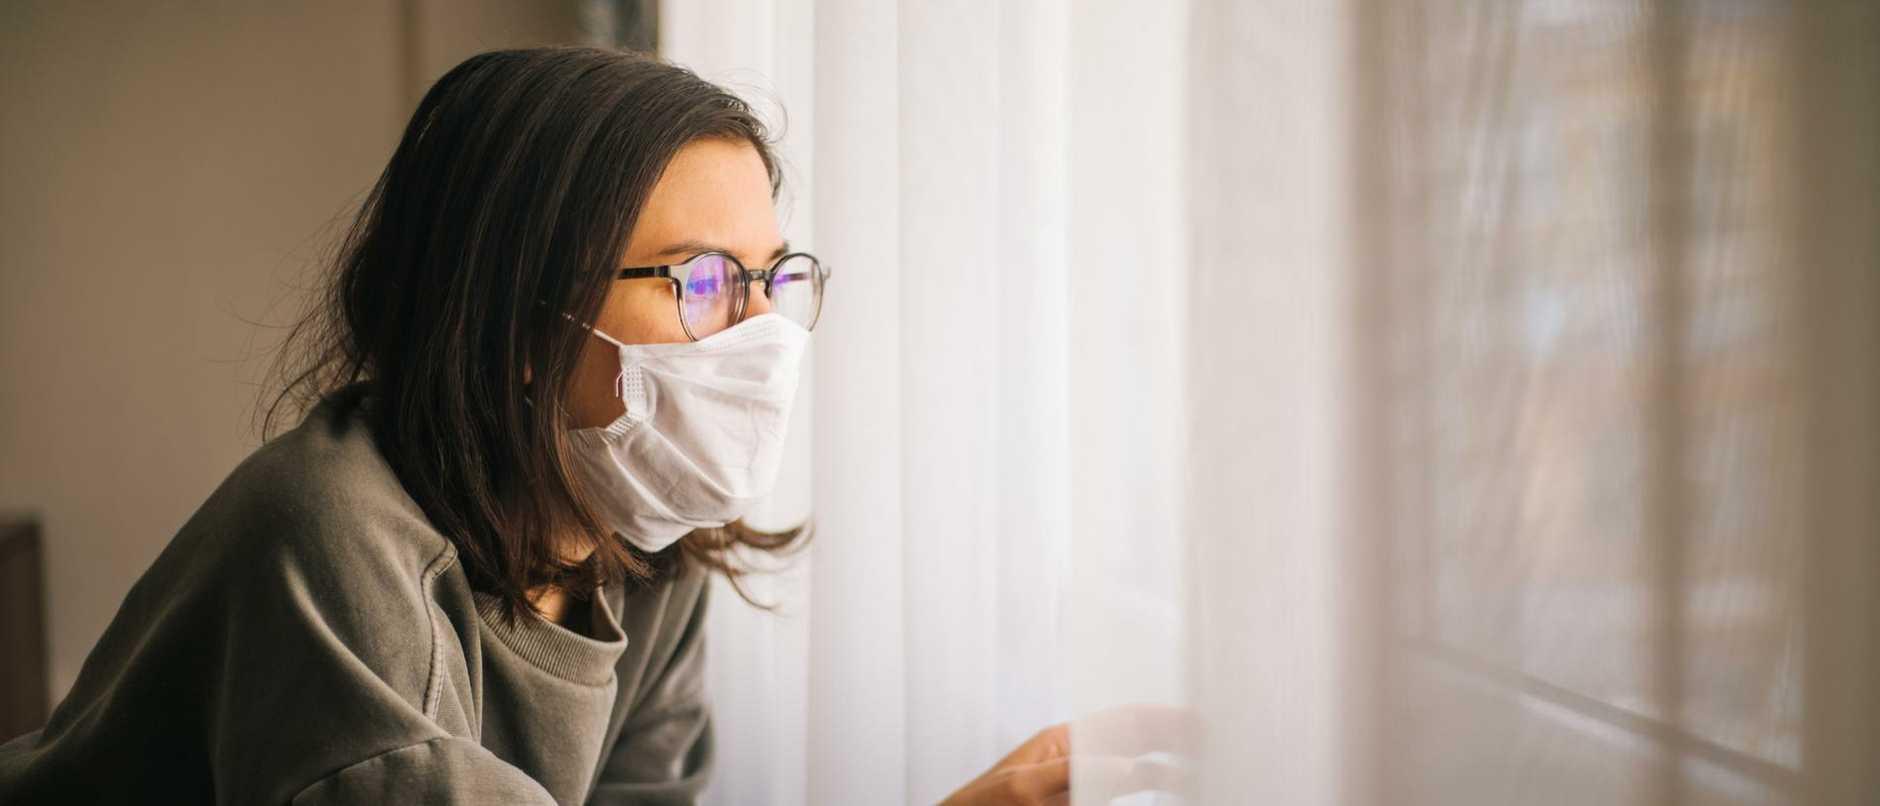 Woman in Isolation Quarantine Coronavirus